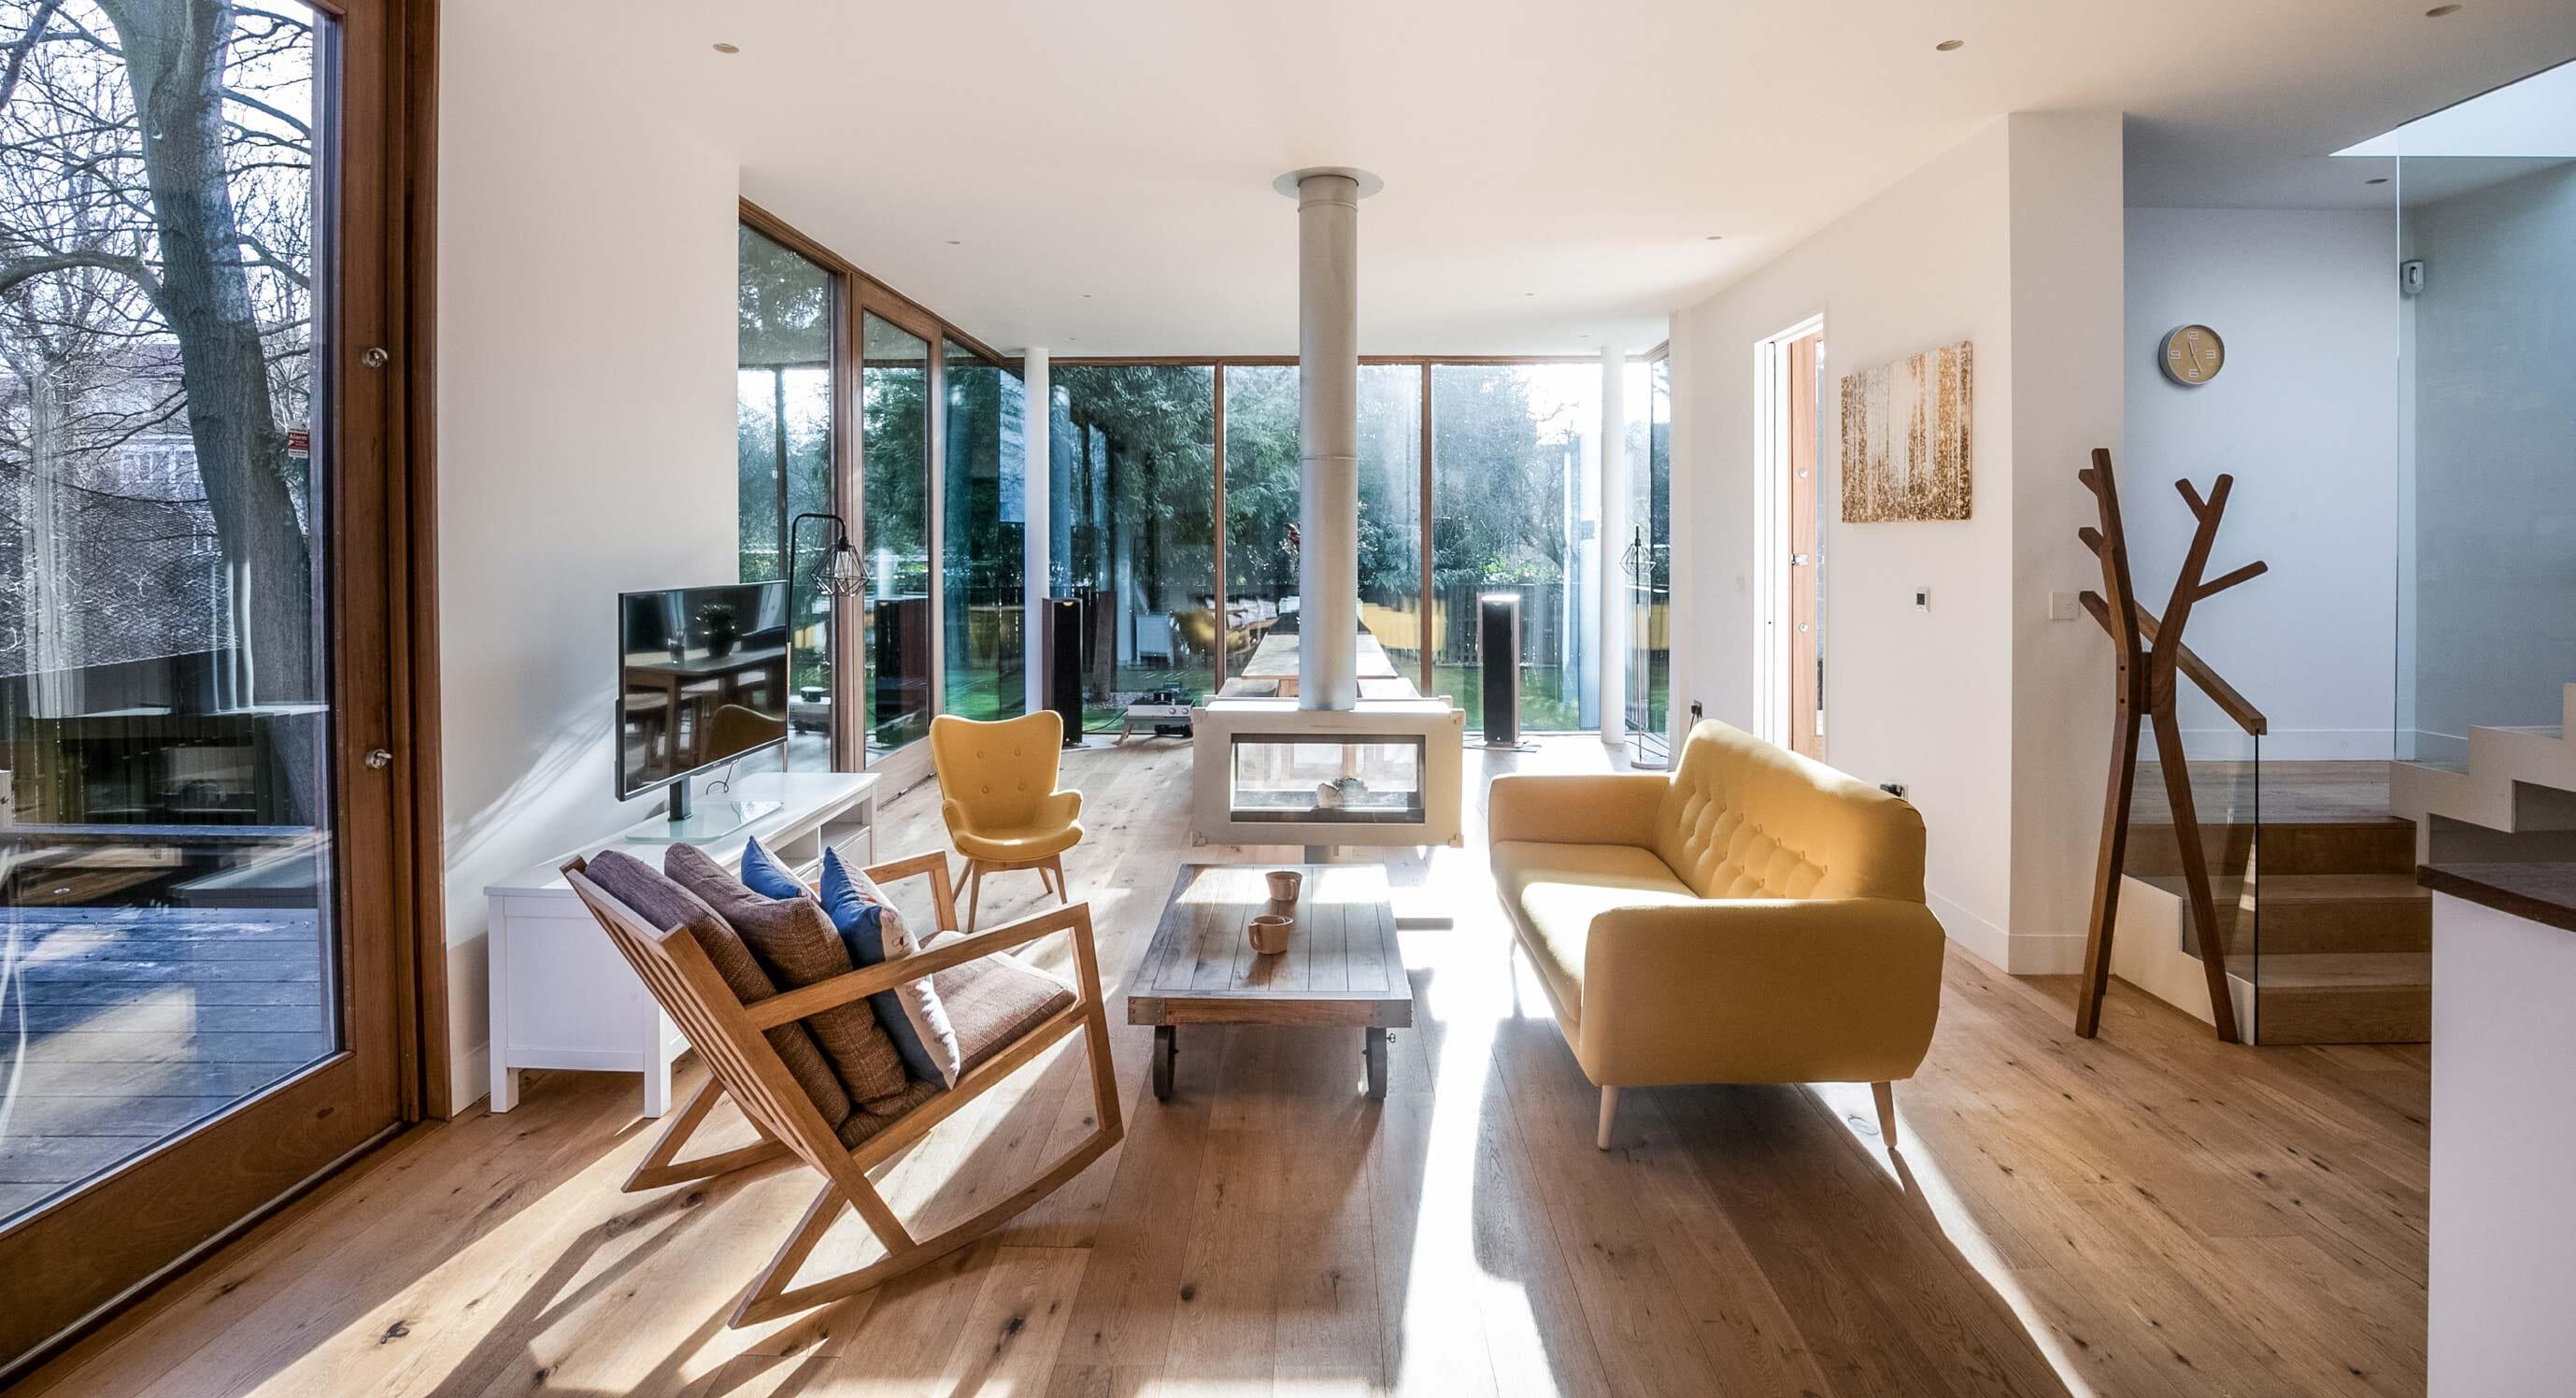 London Property Of The Week: The Tree House II, SE26